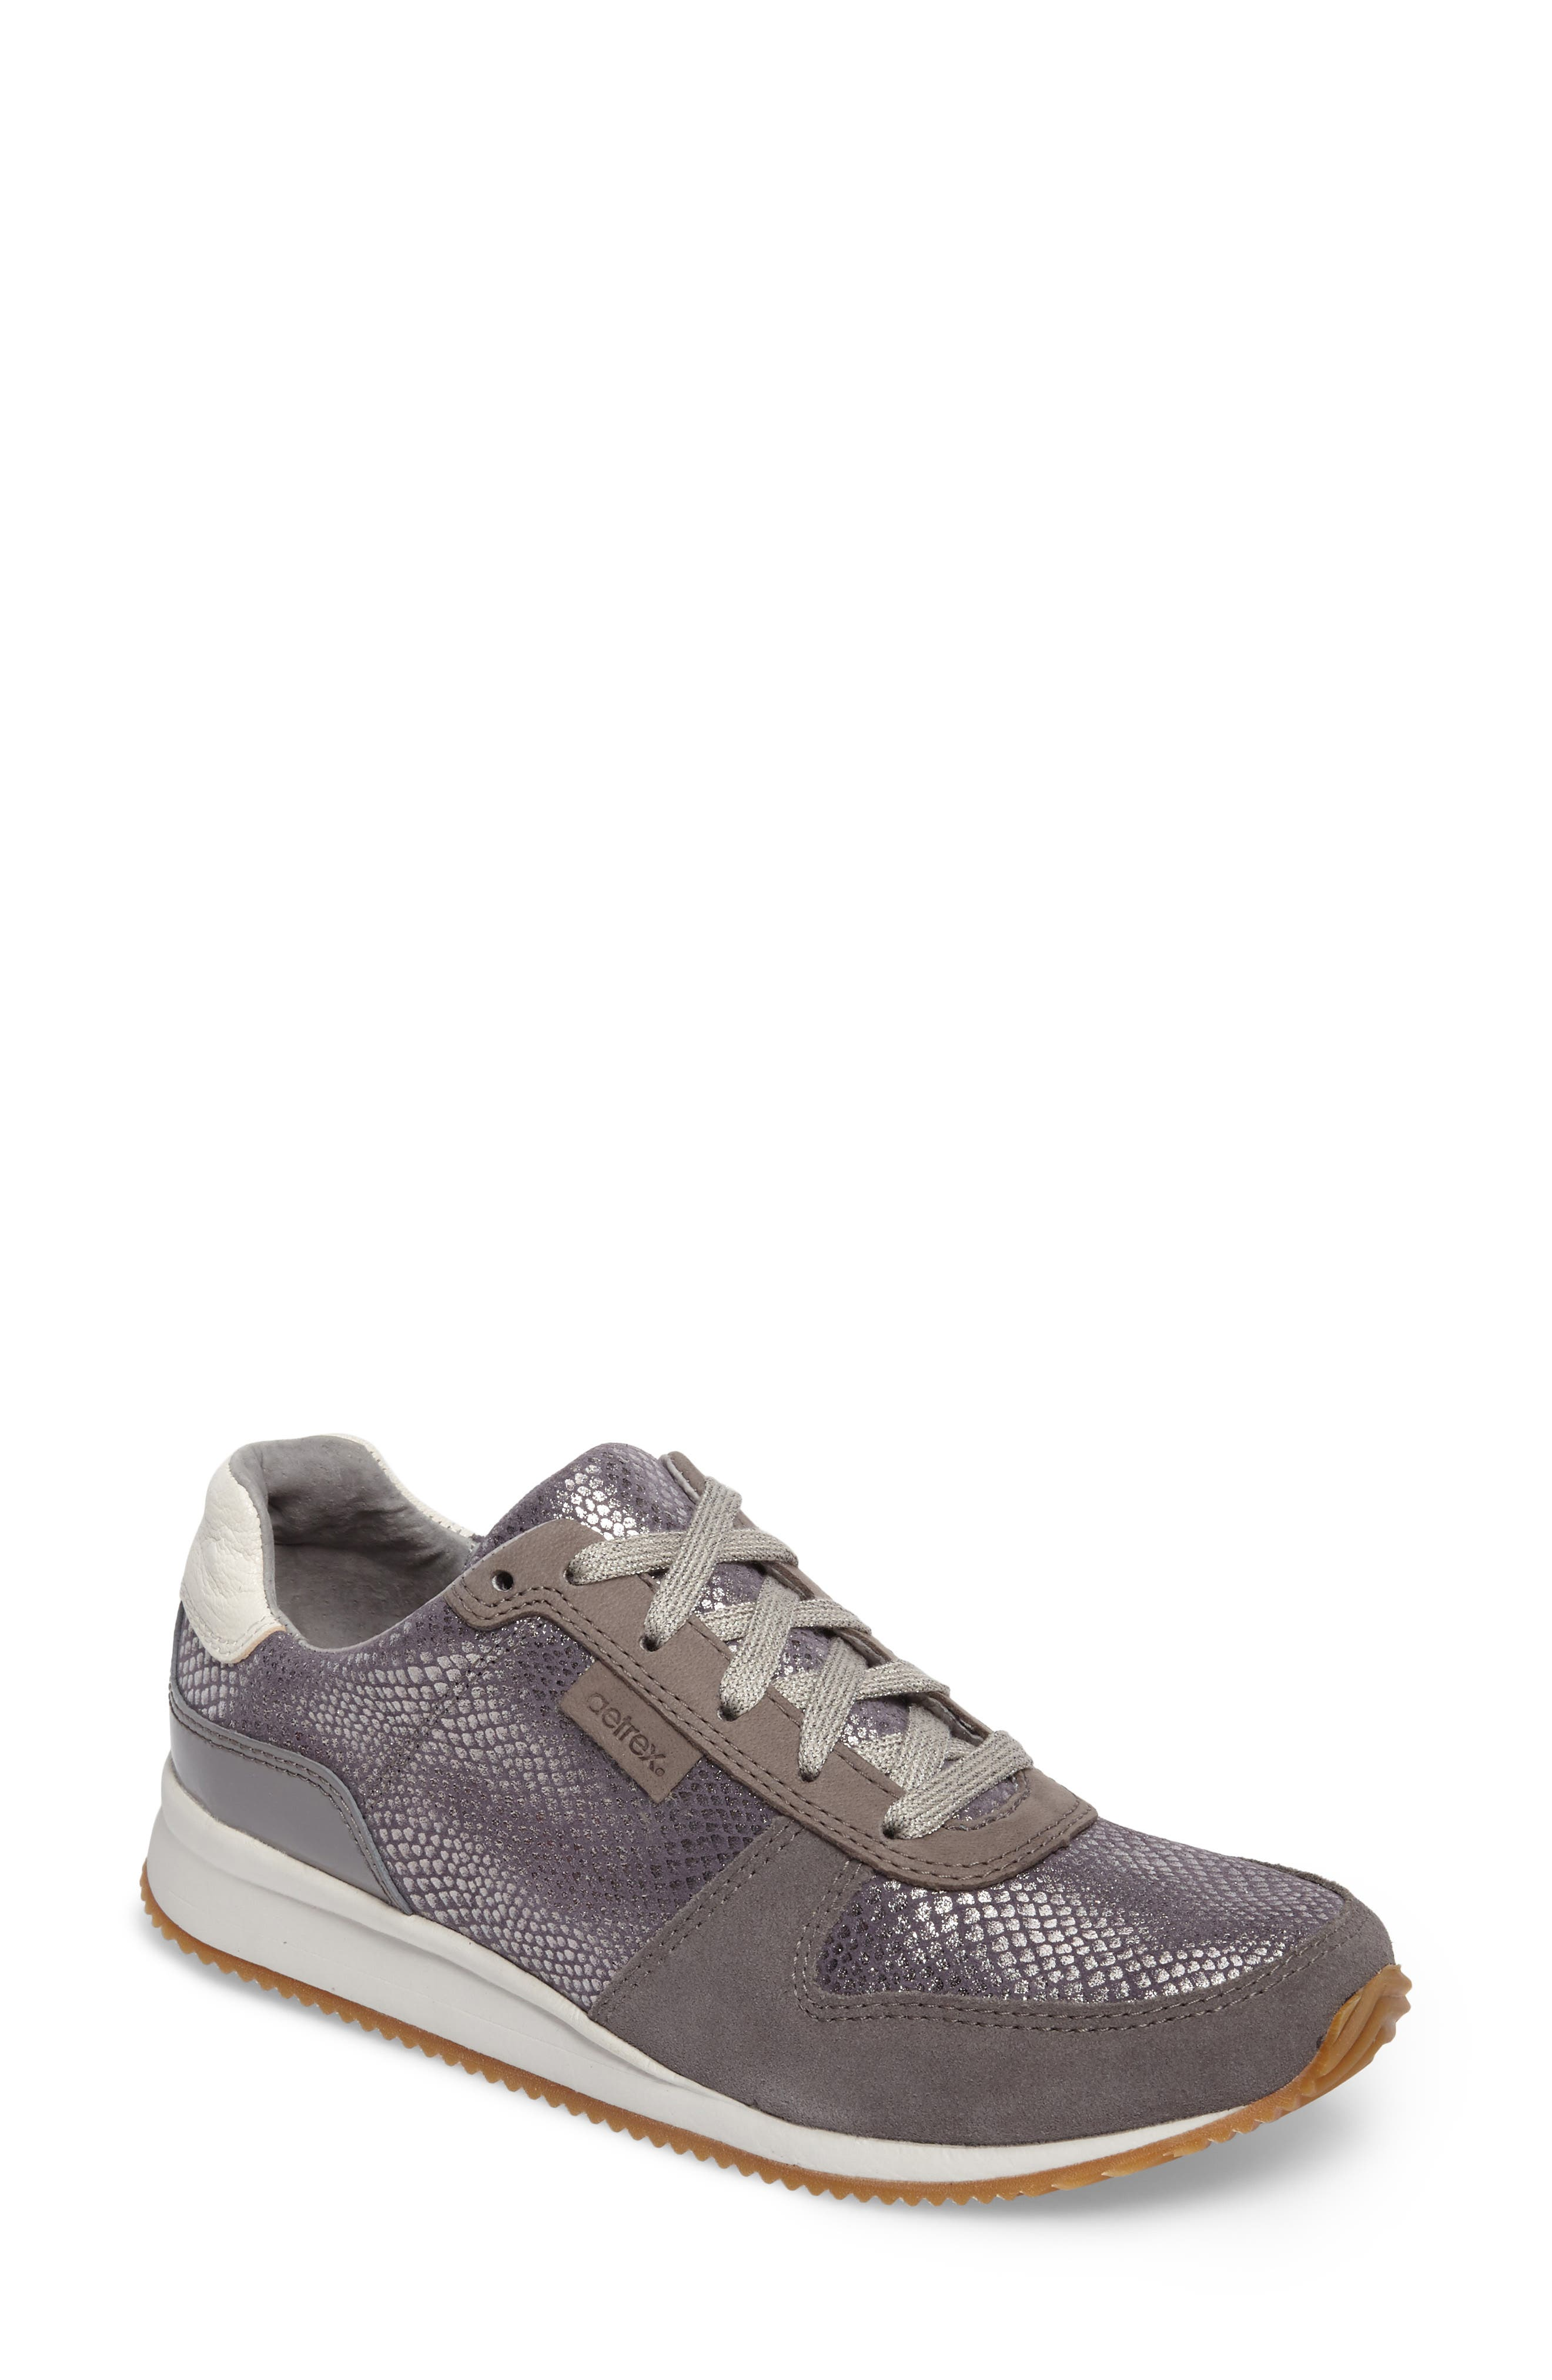 Aetrex Daphne Sneaker, Grey